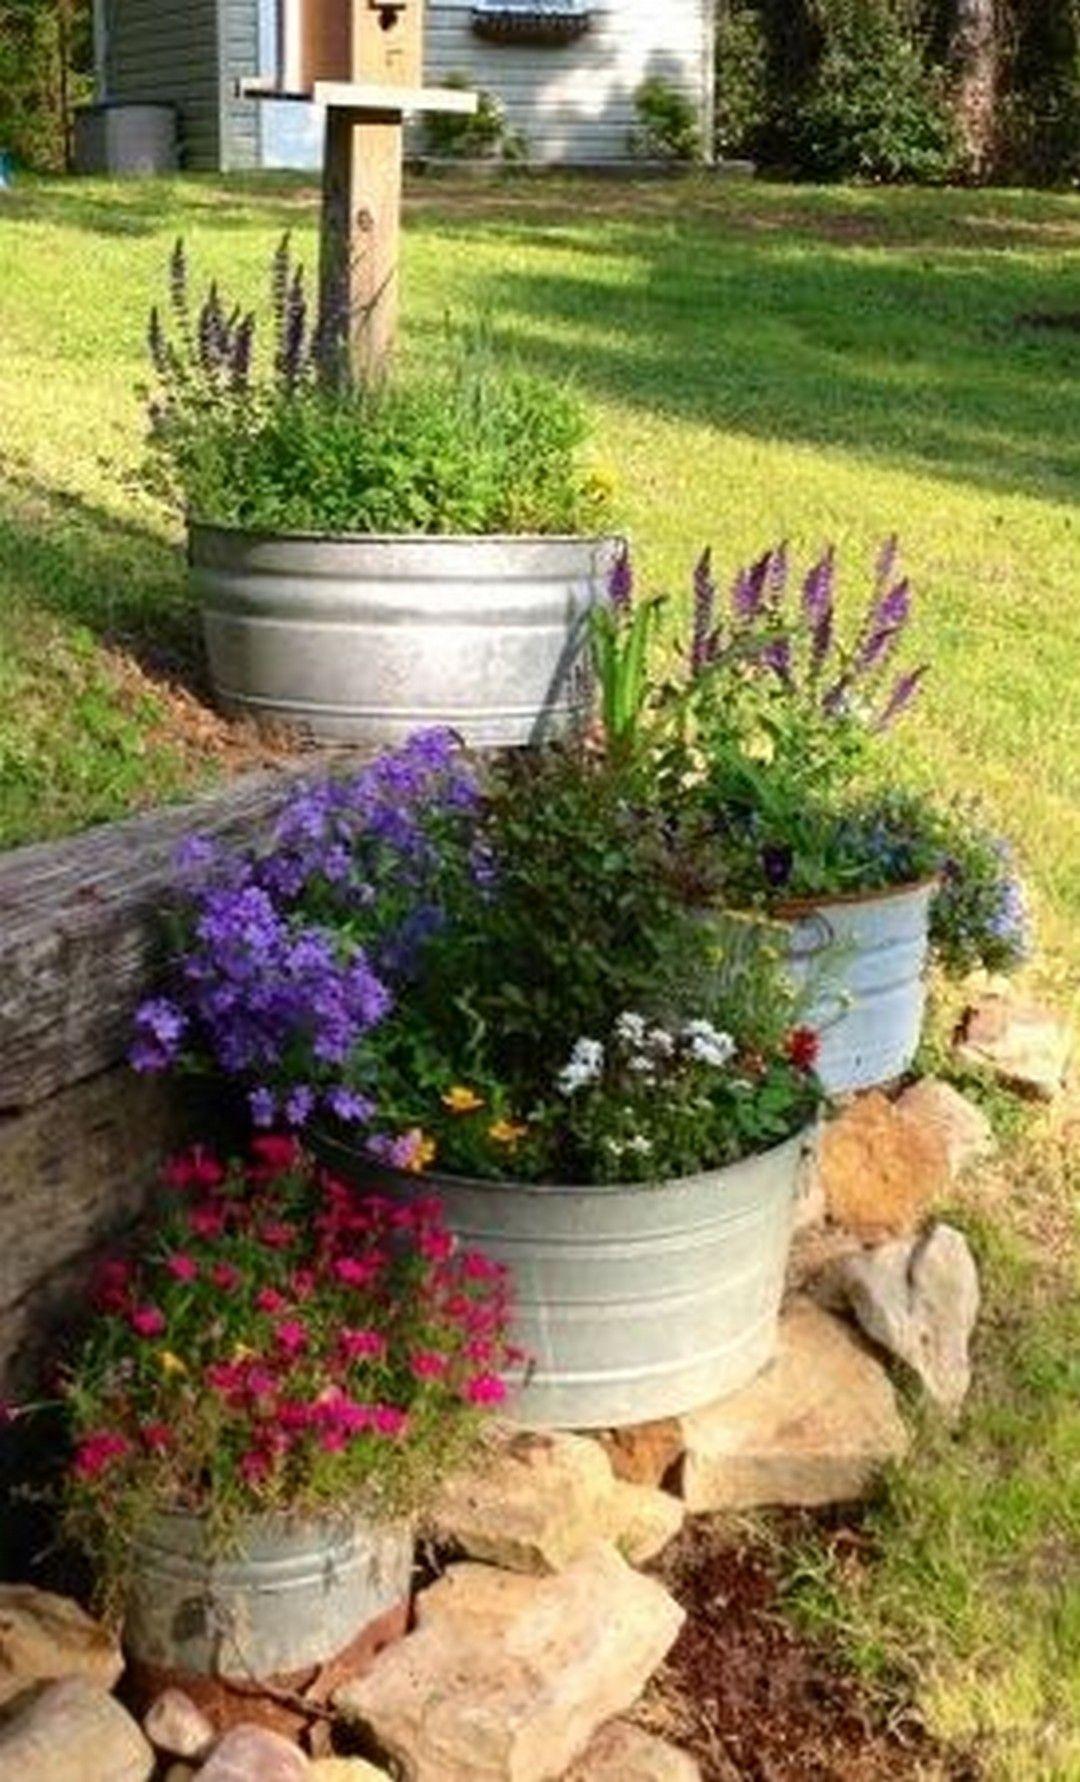 farmhouse landscaping front yard ideas: 20 gorgeous photos